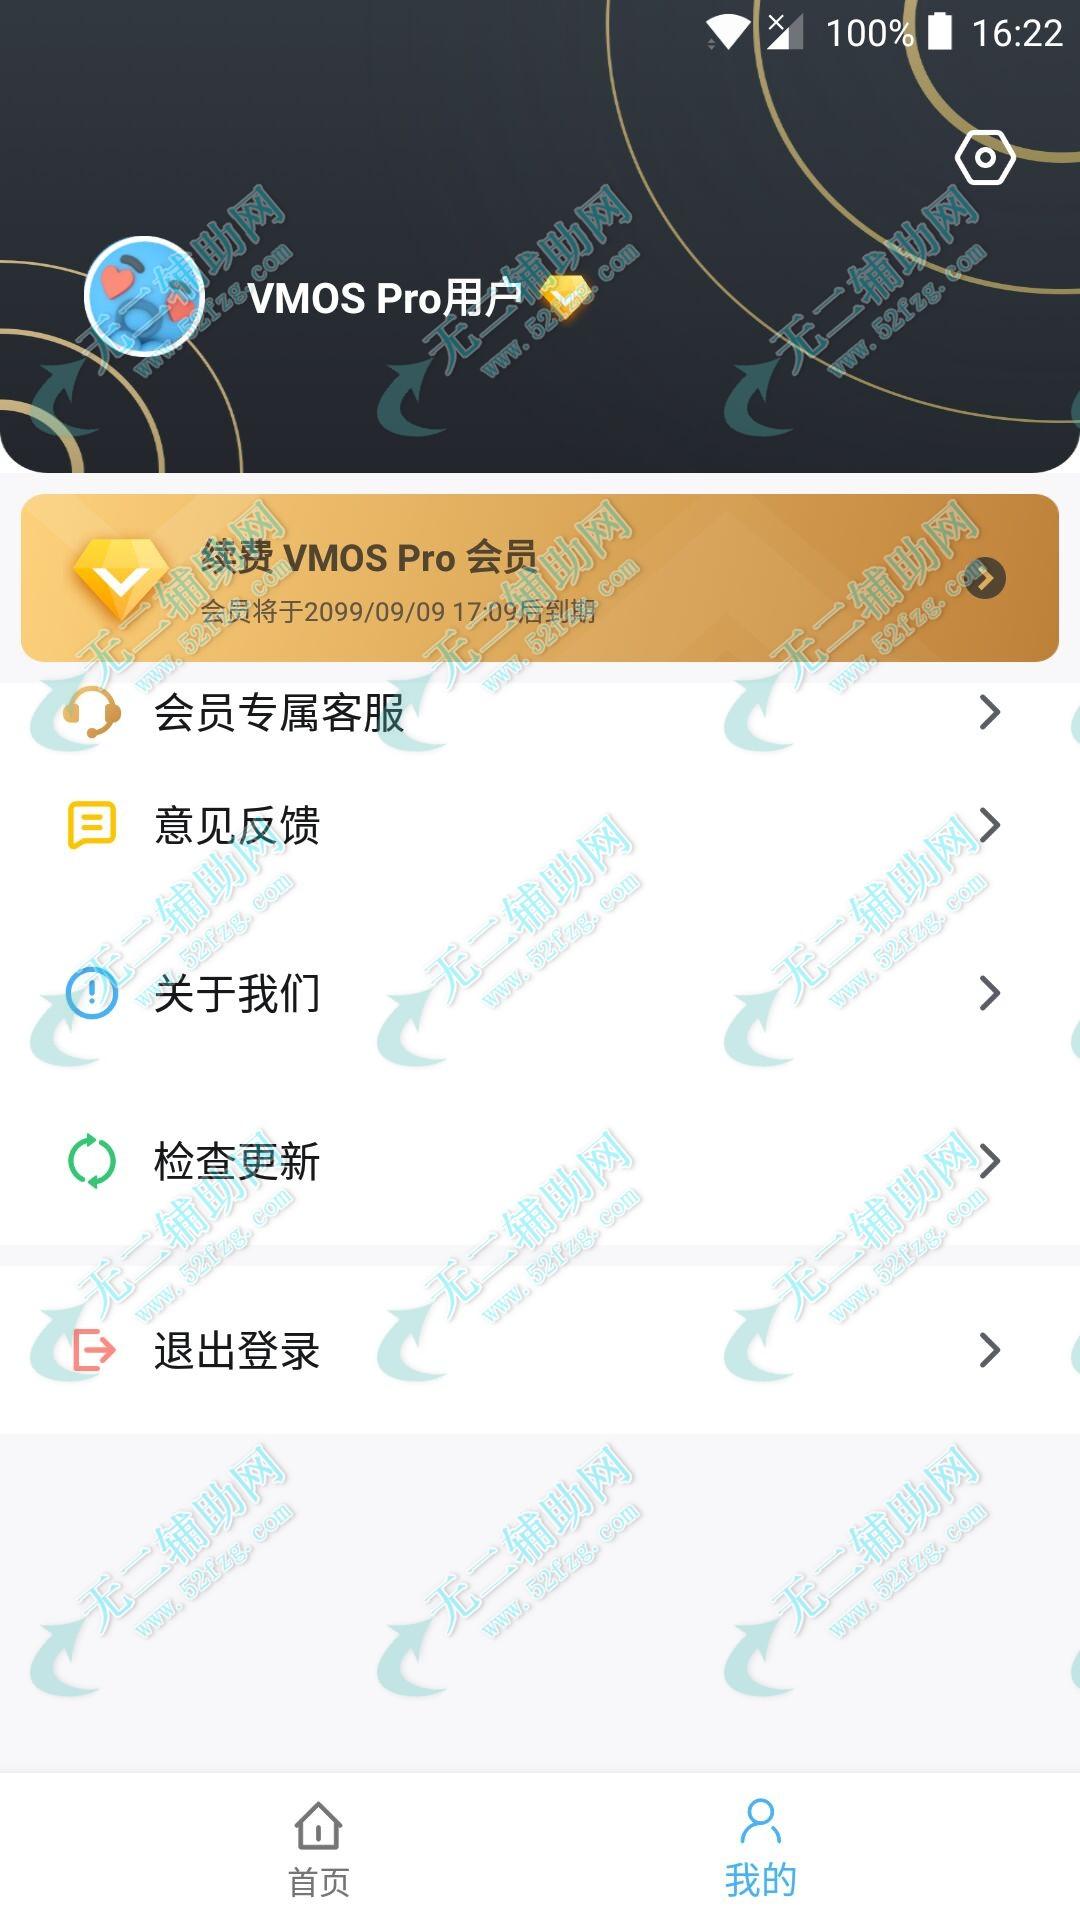 vmos Pro v1.1.17最新无广告vip会员解锁版 手机登陆即为VIP